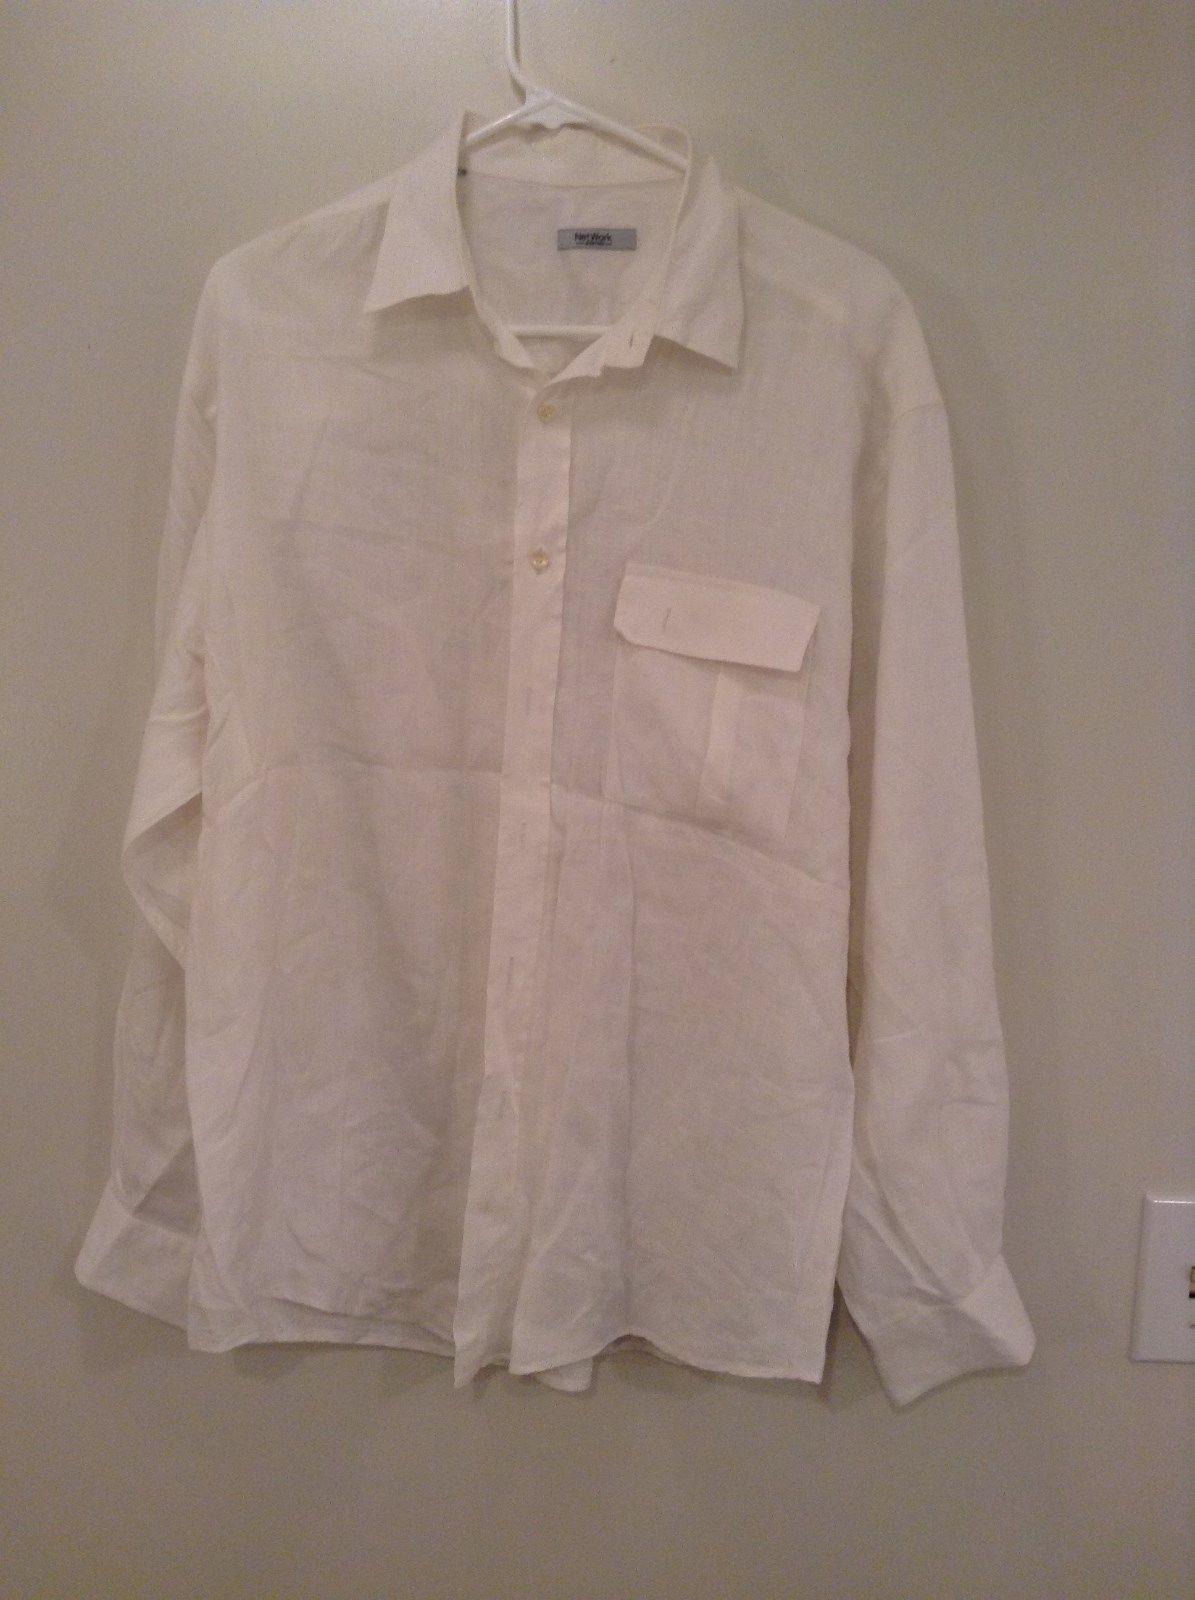 White Button Up Long Sleeve 100 Percent Linen Shirt Network Size 41